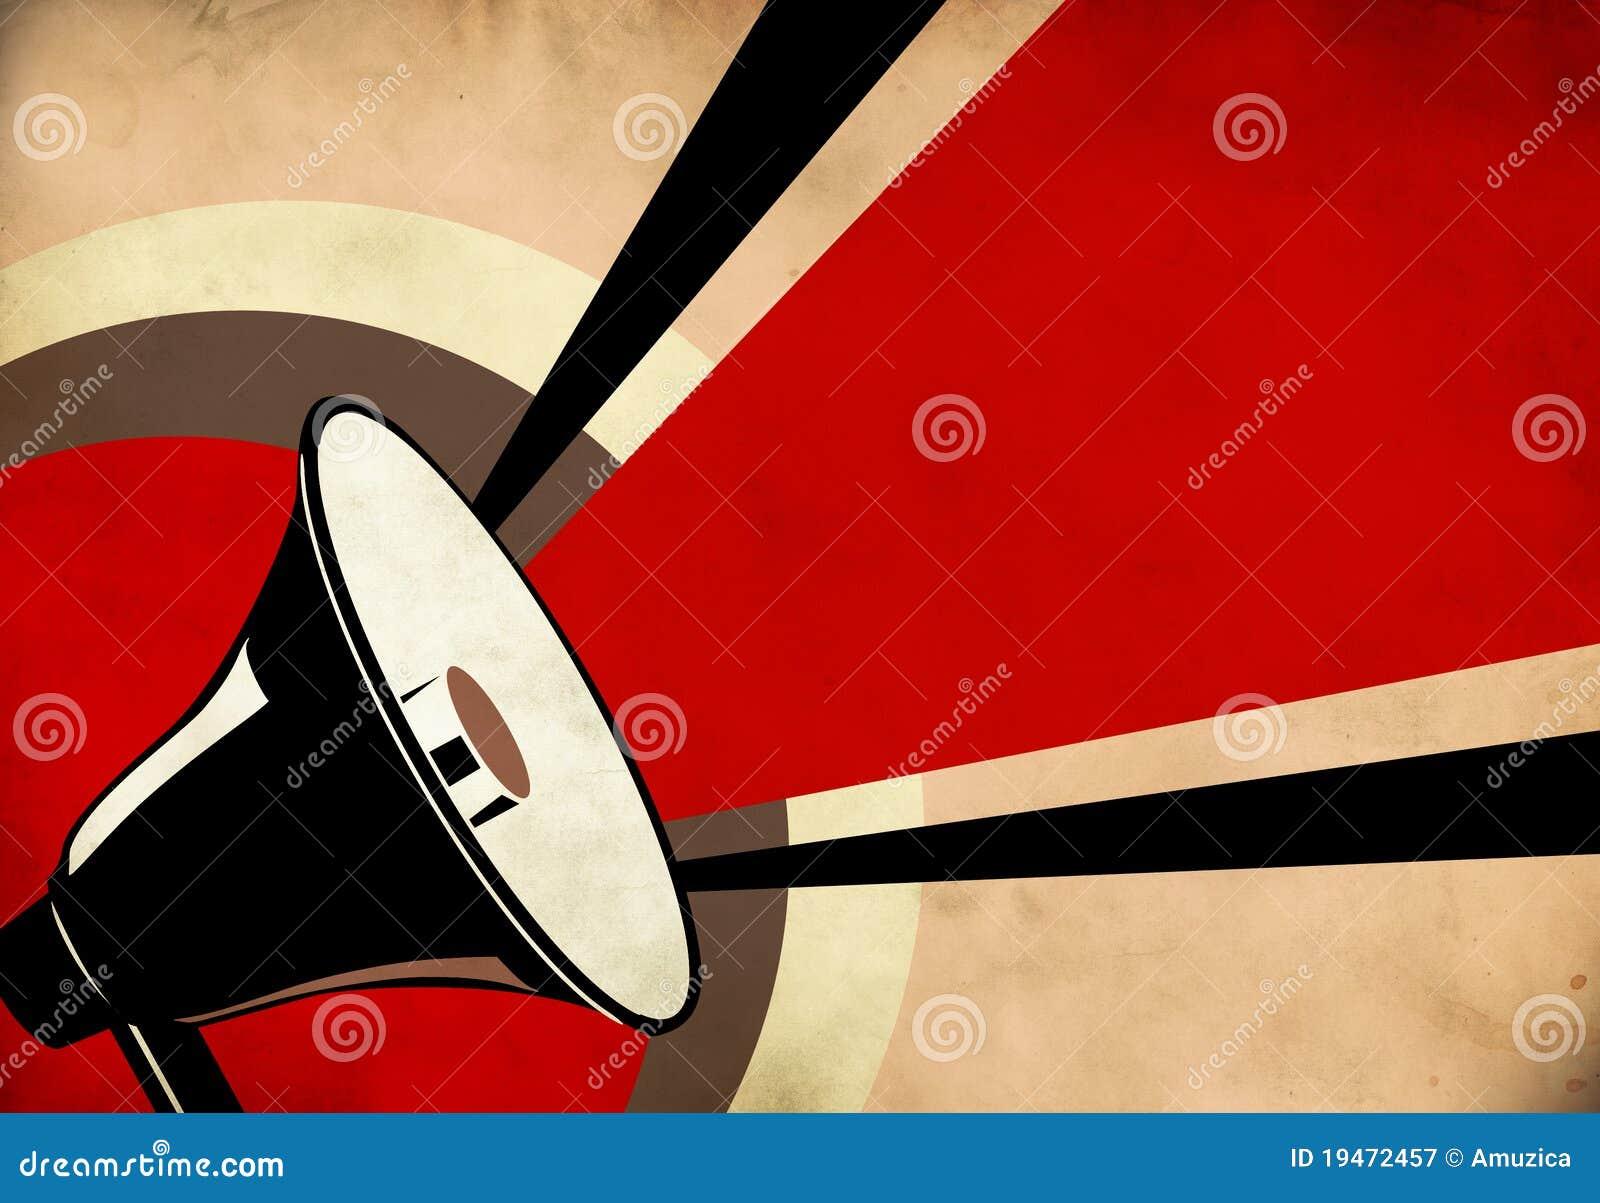 megaphone or loudspeaker on grunge background royalty free